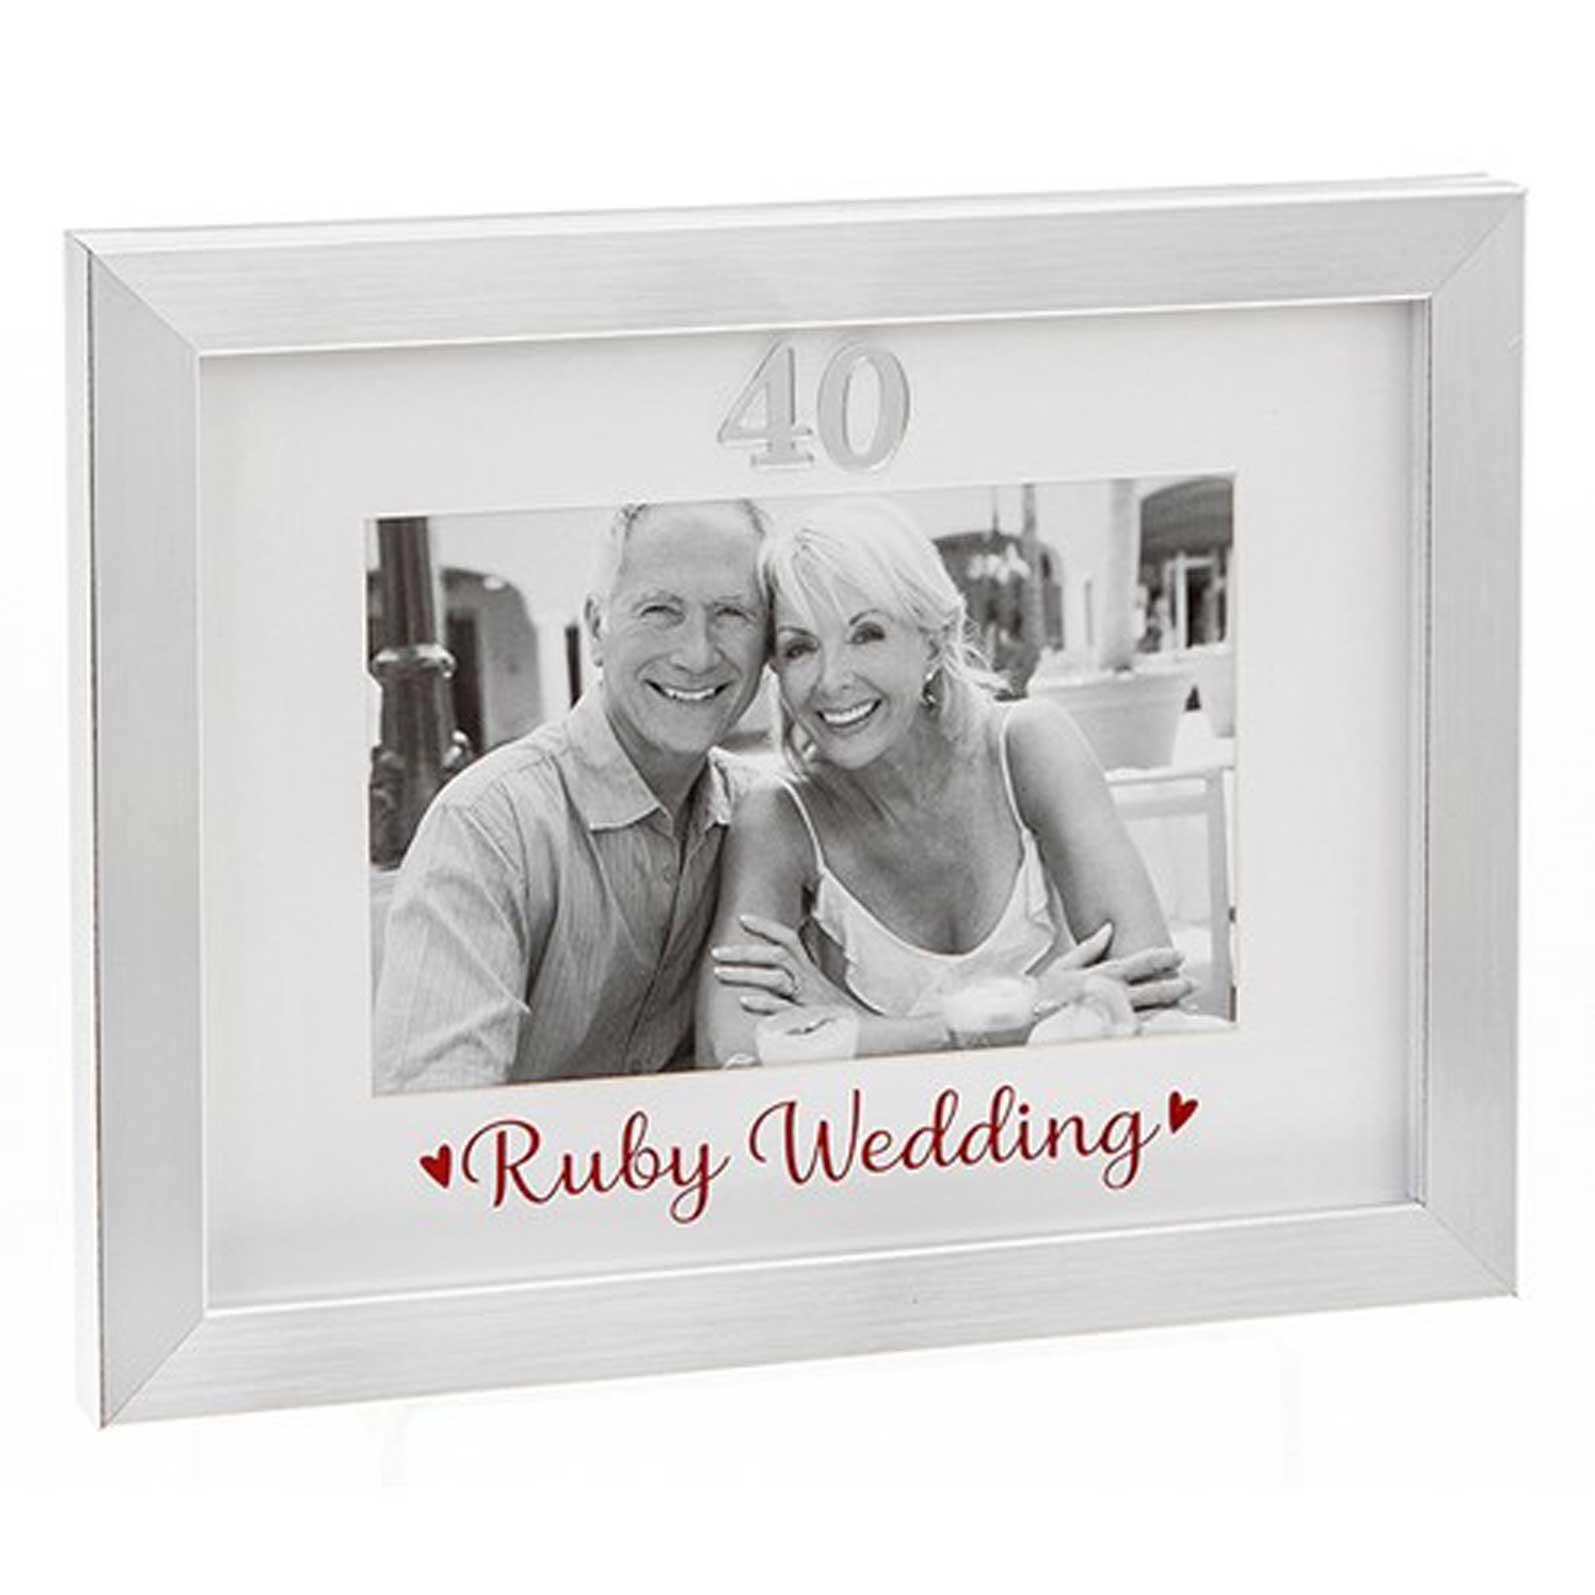 Ruby Wedding Photo Frame 6x4 290330 40th Anniversary